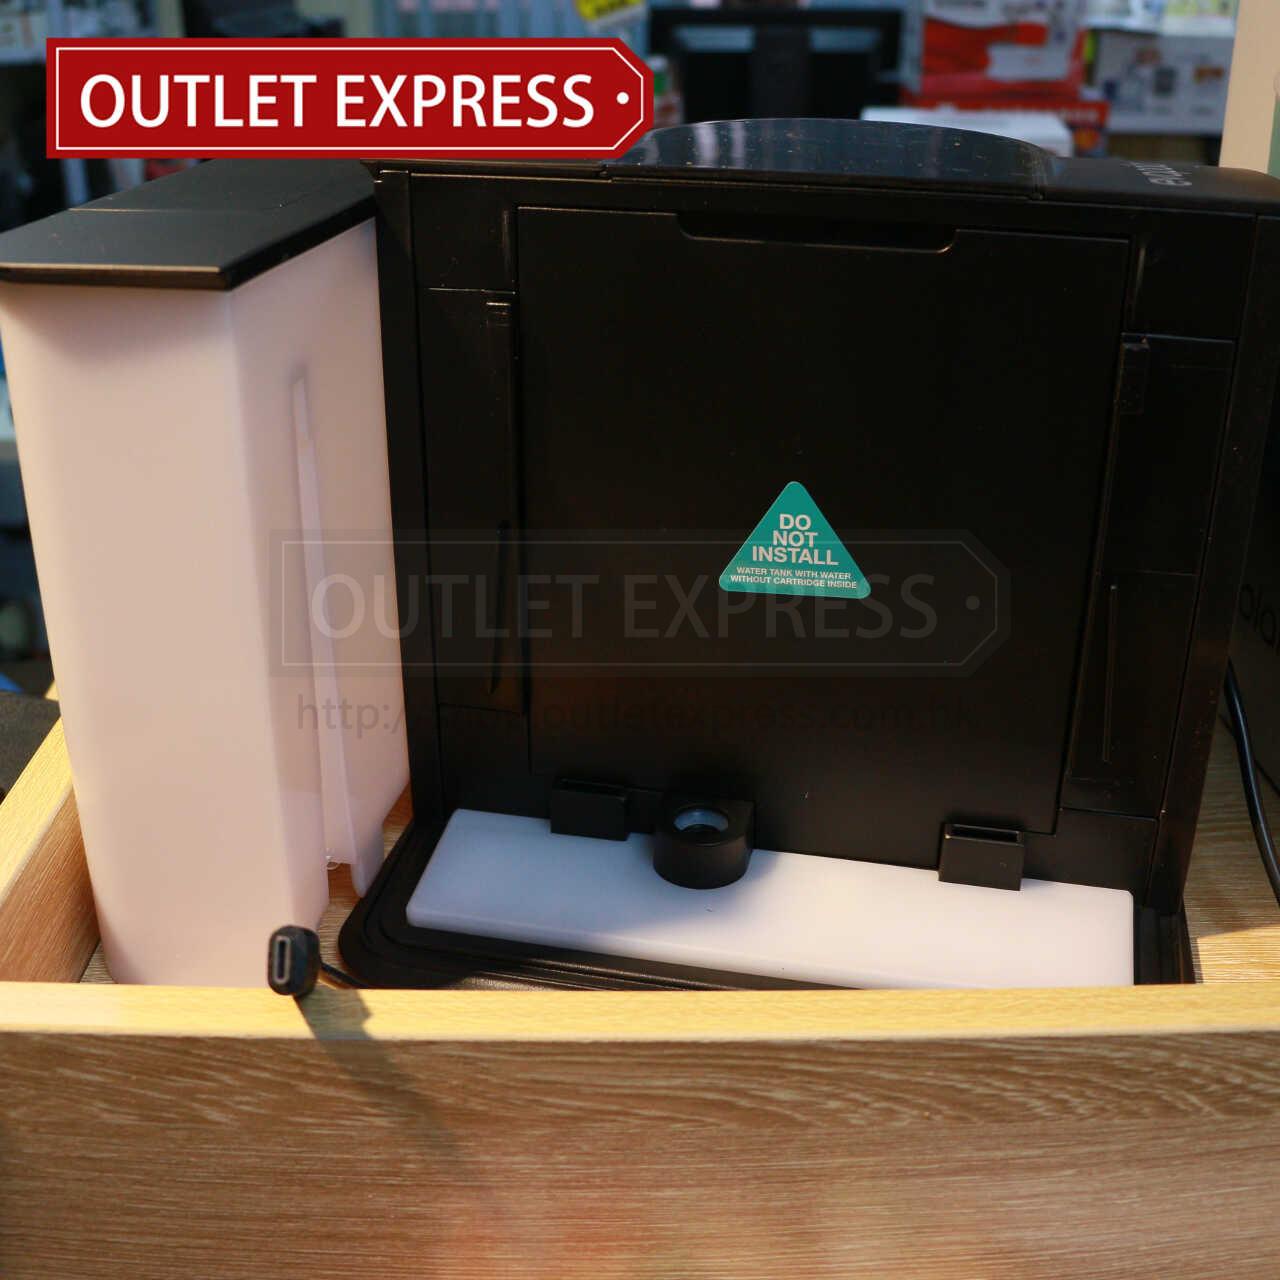 Evapolar 二代小型個人流動冷氣機 (evaSMART EV-3000) | 智能水冷風機 ( 現貨發售 ) | 香港行貨 濾網- Outlet Express HK生活百貨城實拍相片